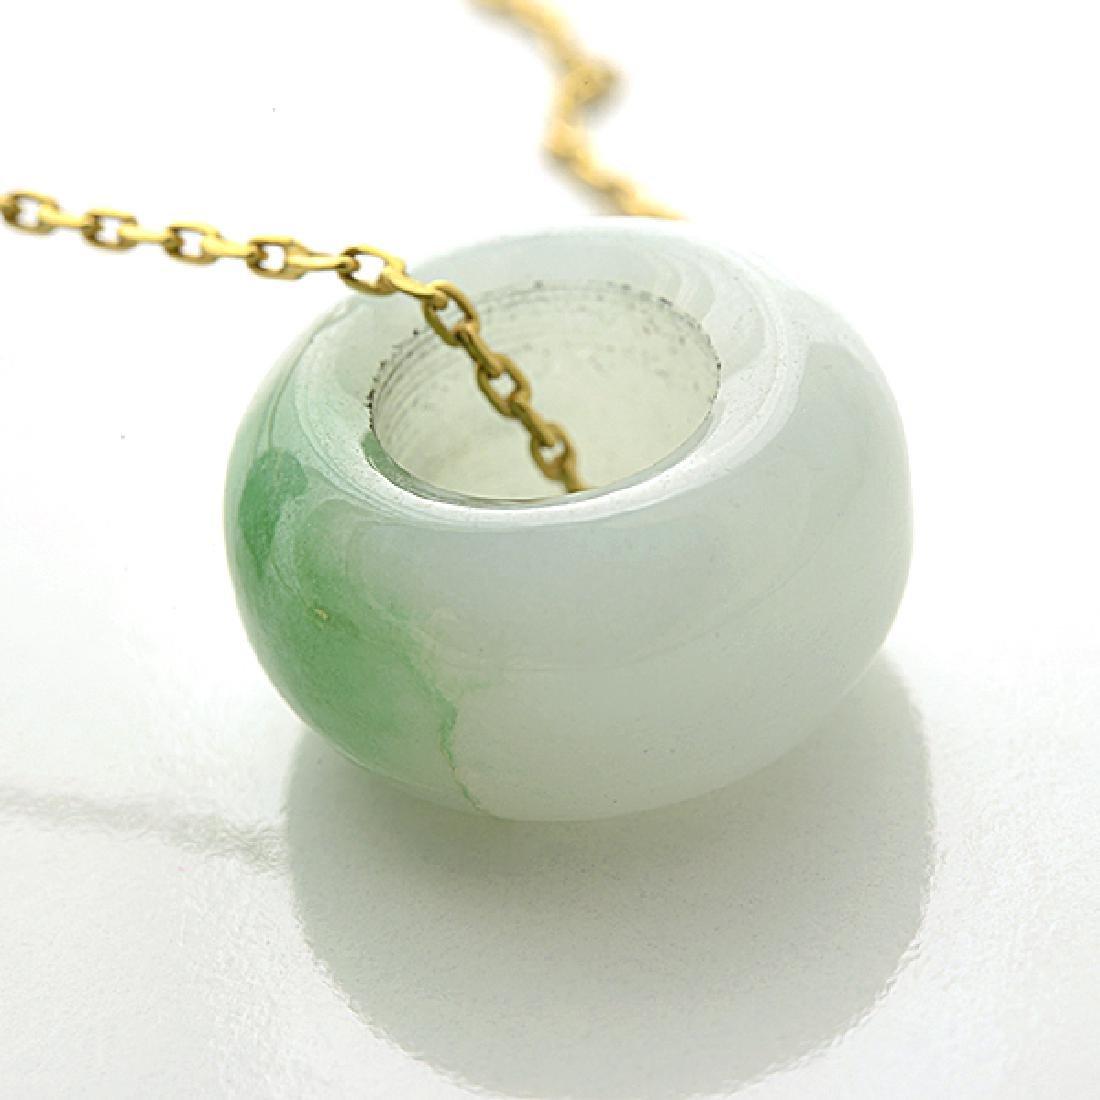 Multi-Stone, Diamond, Yellow Gold Pendant Necklace. - 4